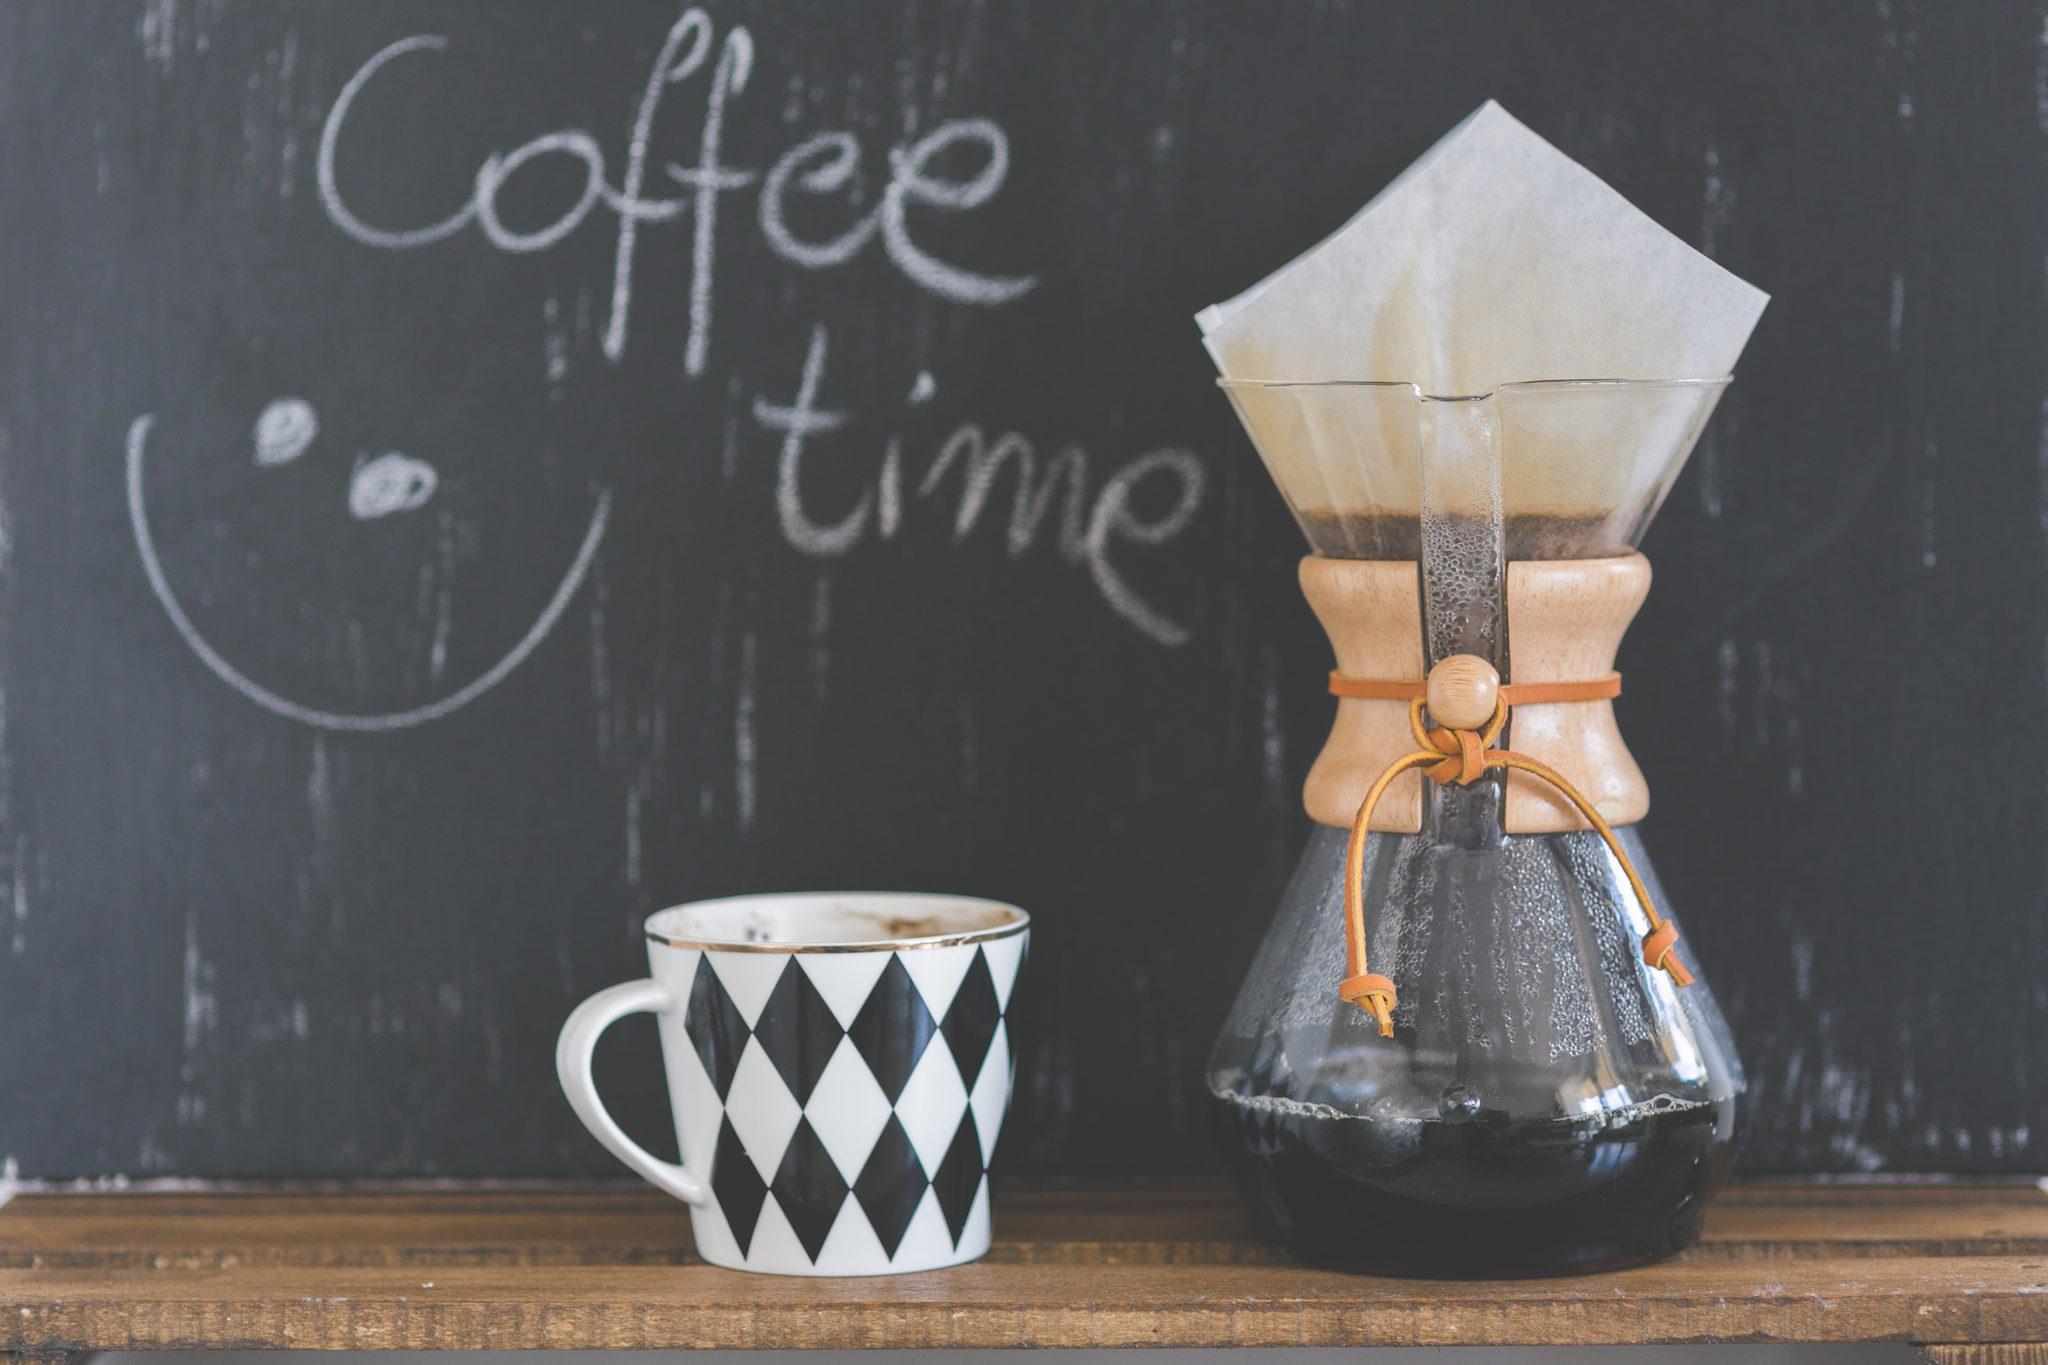 coffee-cup-mug-cafe_free